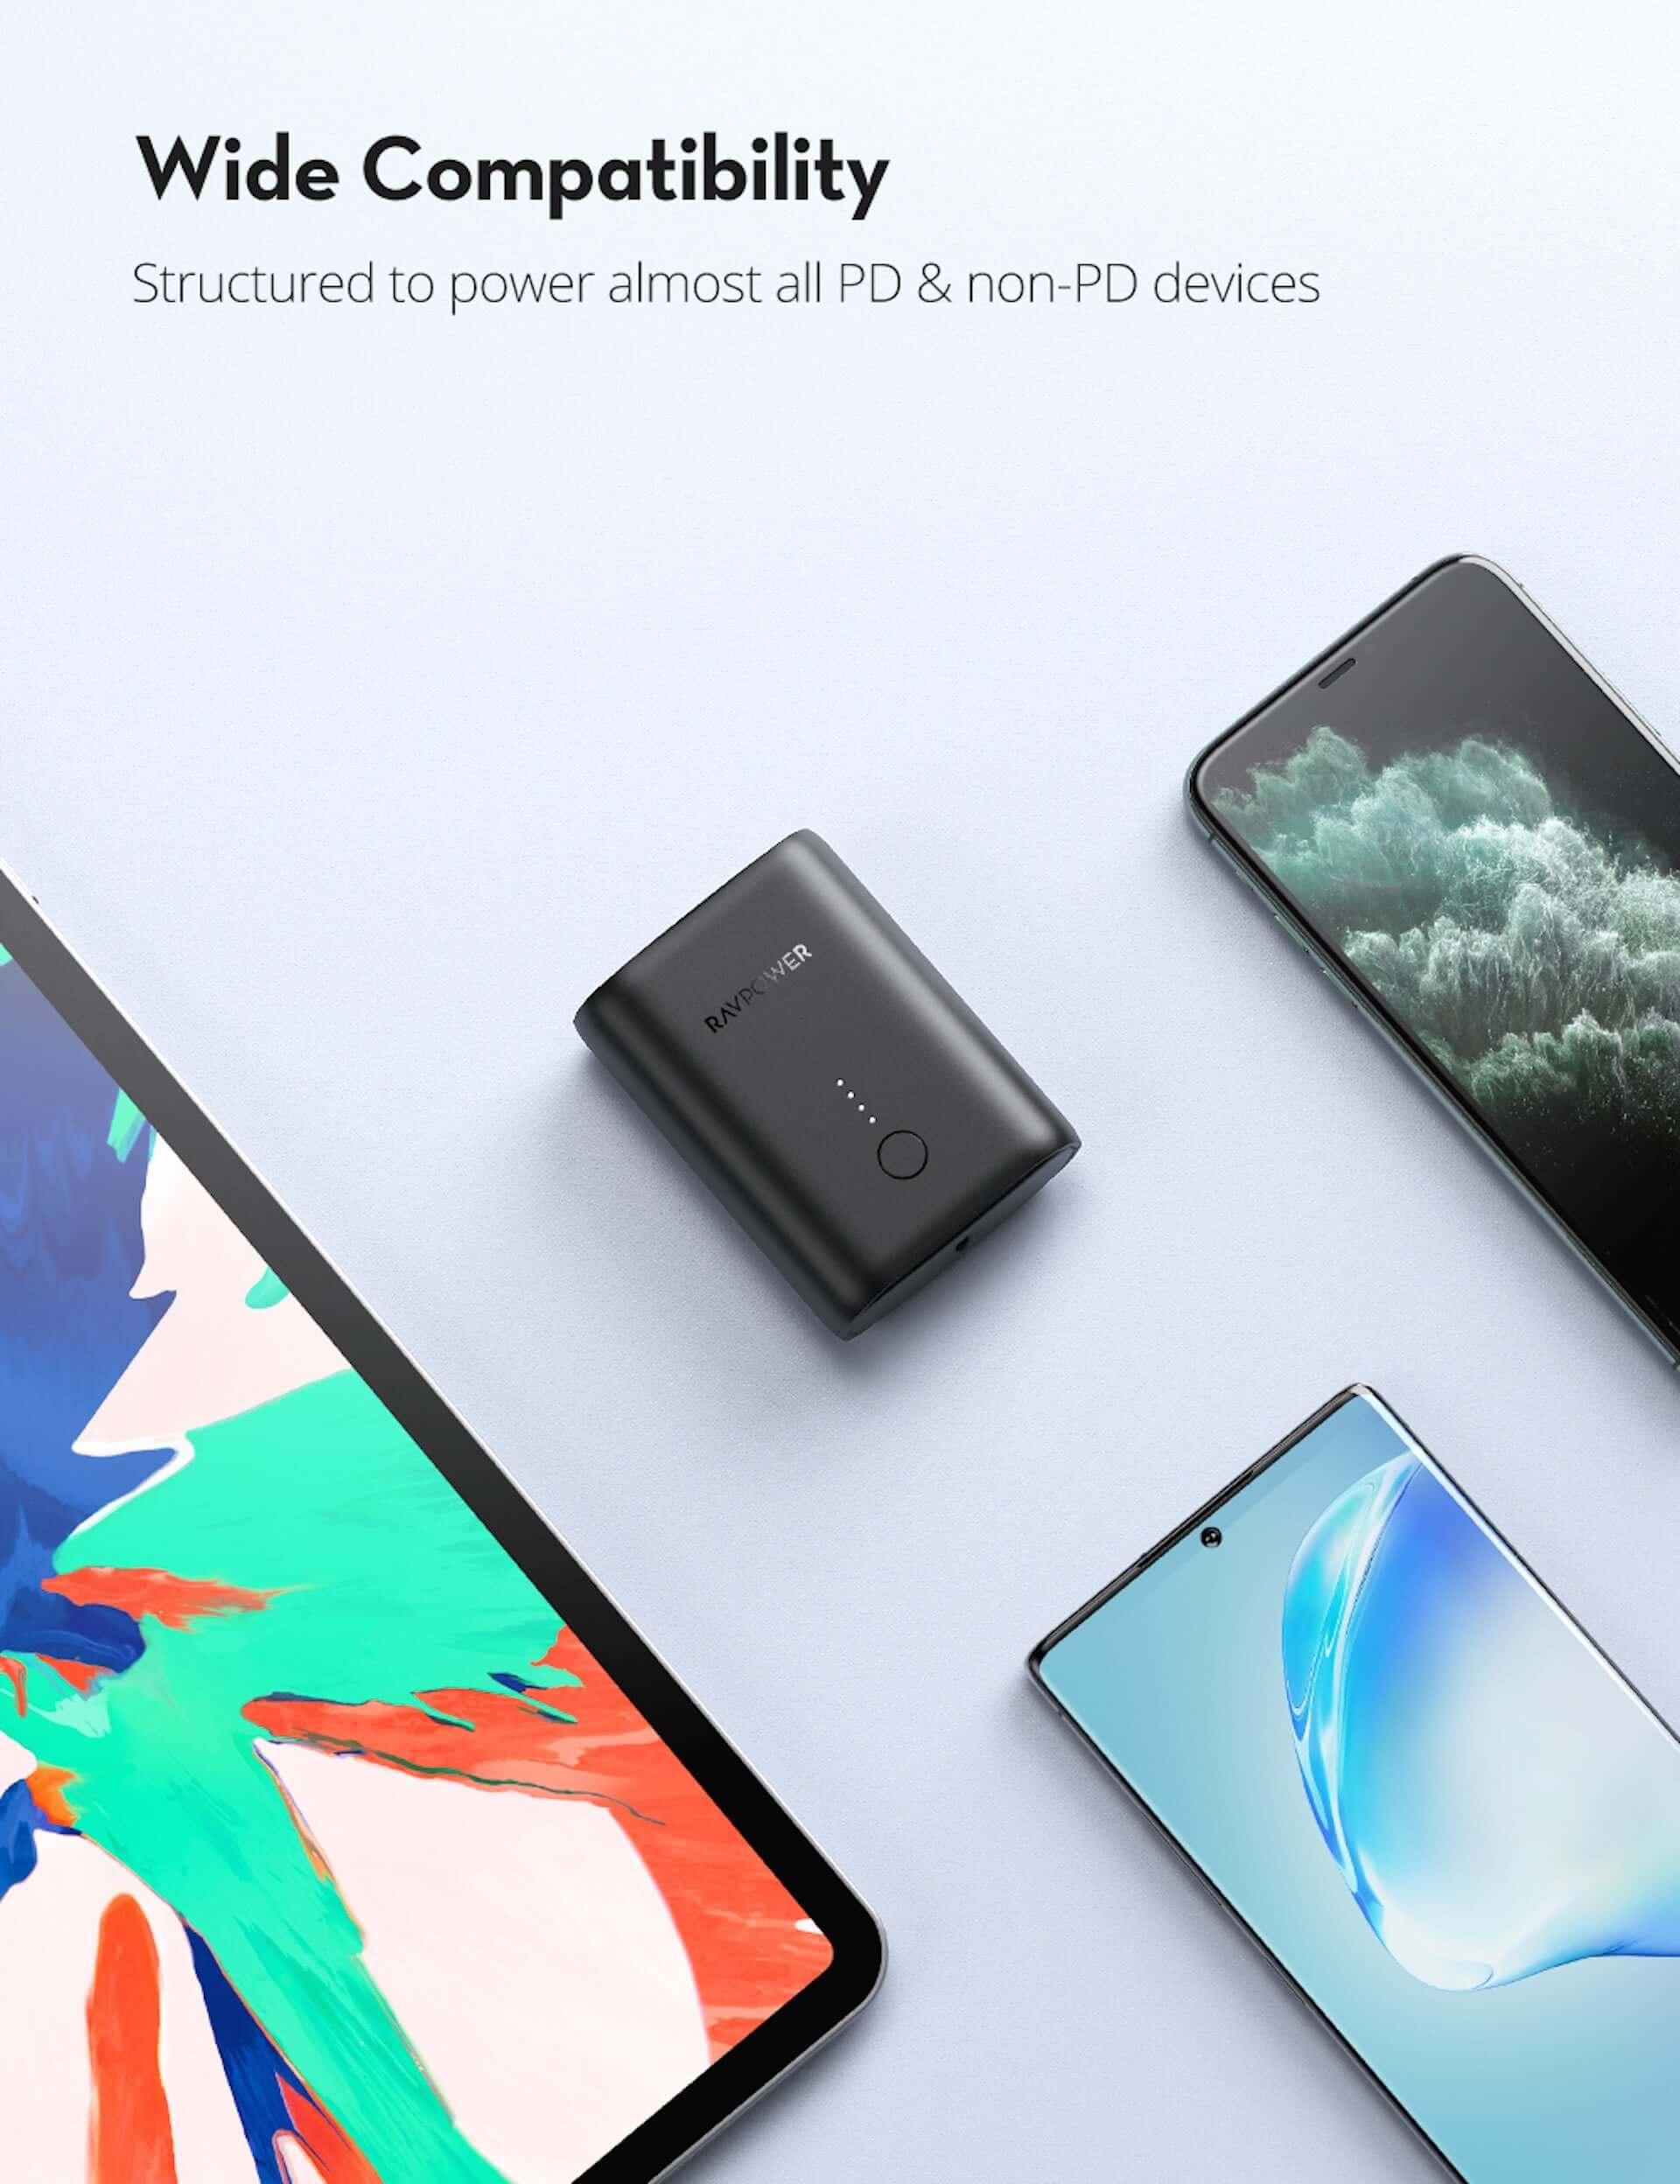 10000mAhの大容量モバイルバッテリーがRAVPowerから発売中!名刺入れやカードよりも小さいサイズ tech200727_ravpower_07-1920x2496